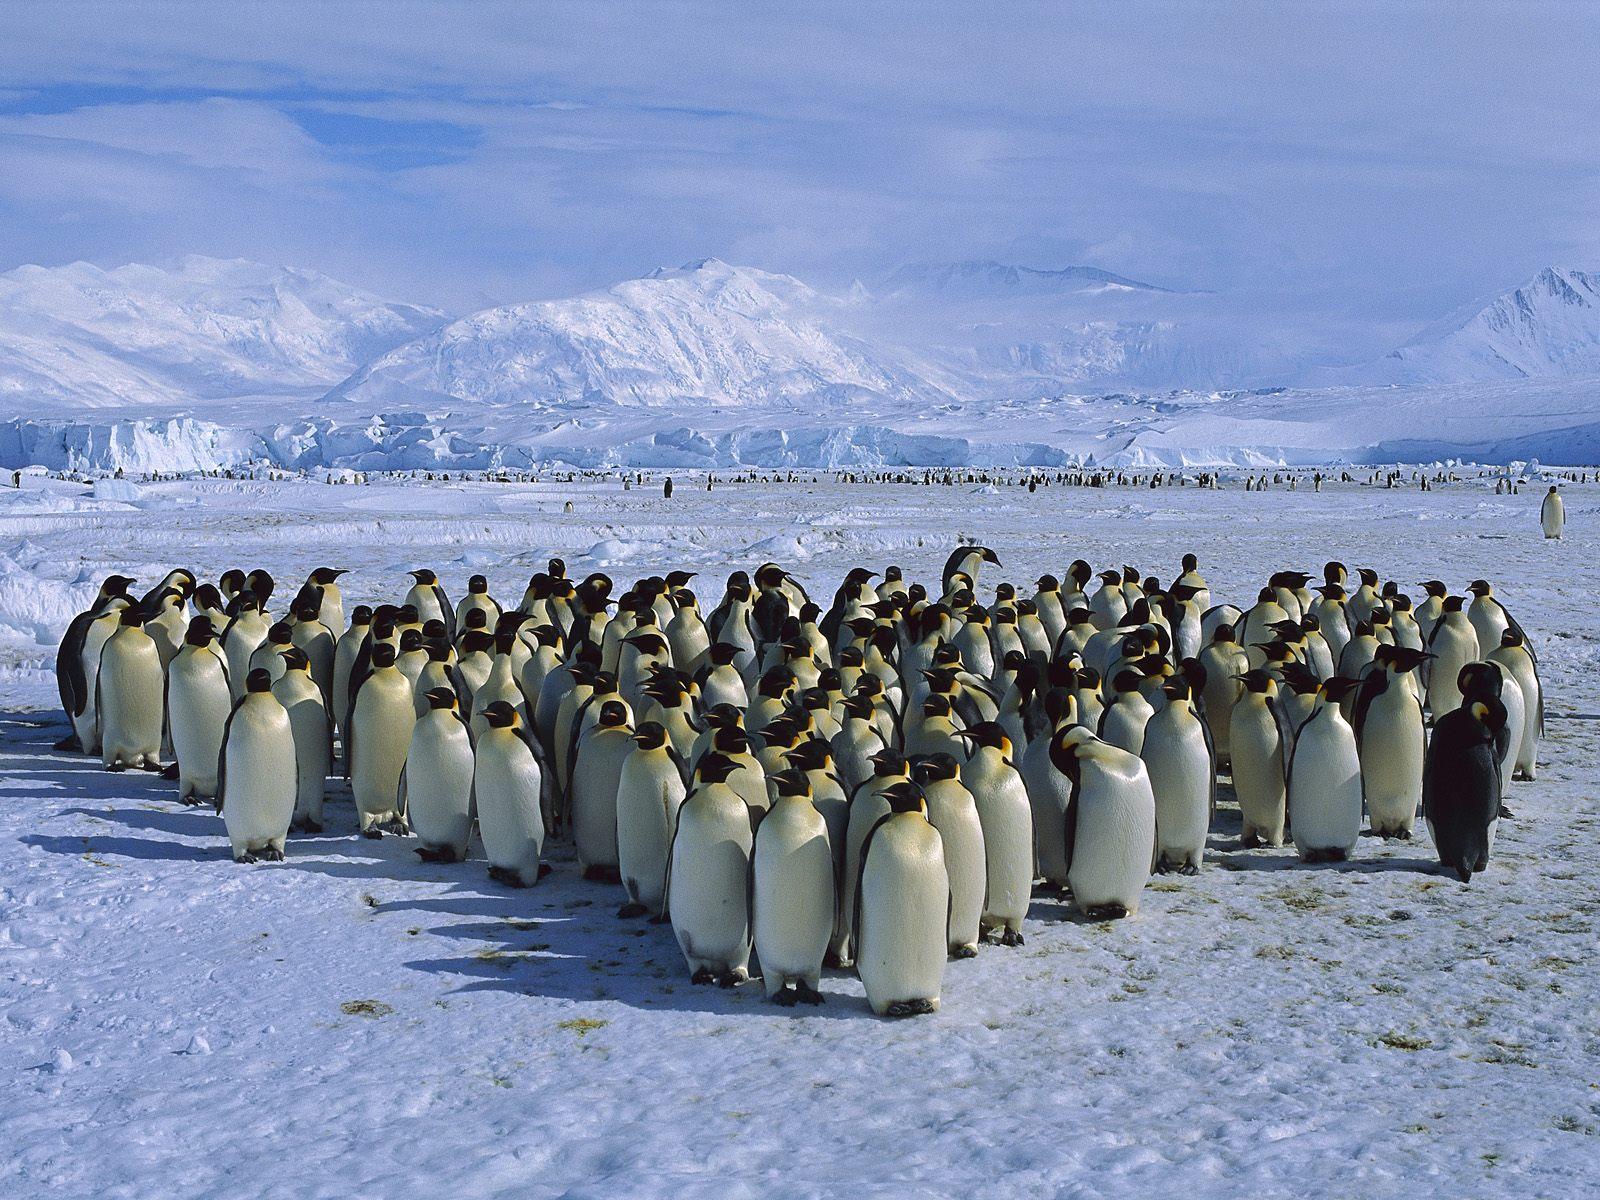 pinguin_wallpaper